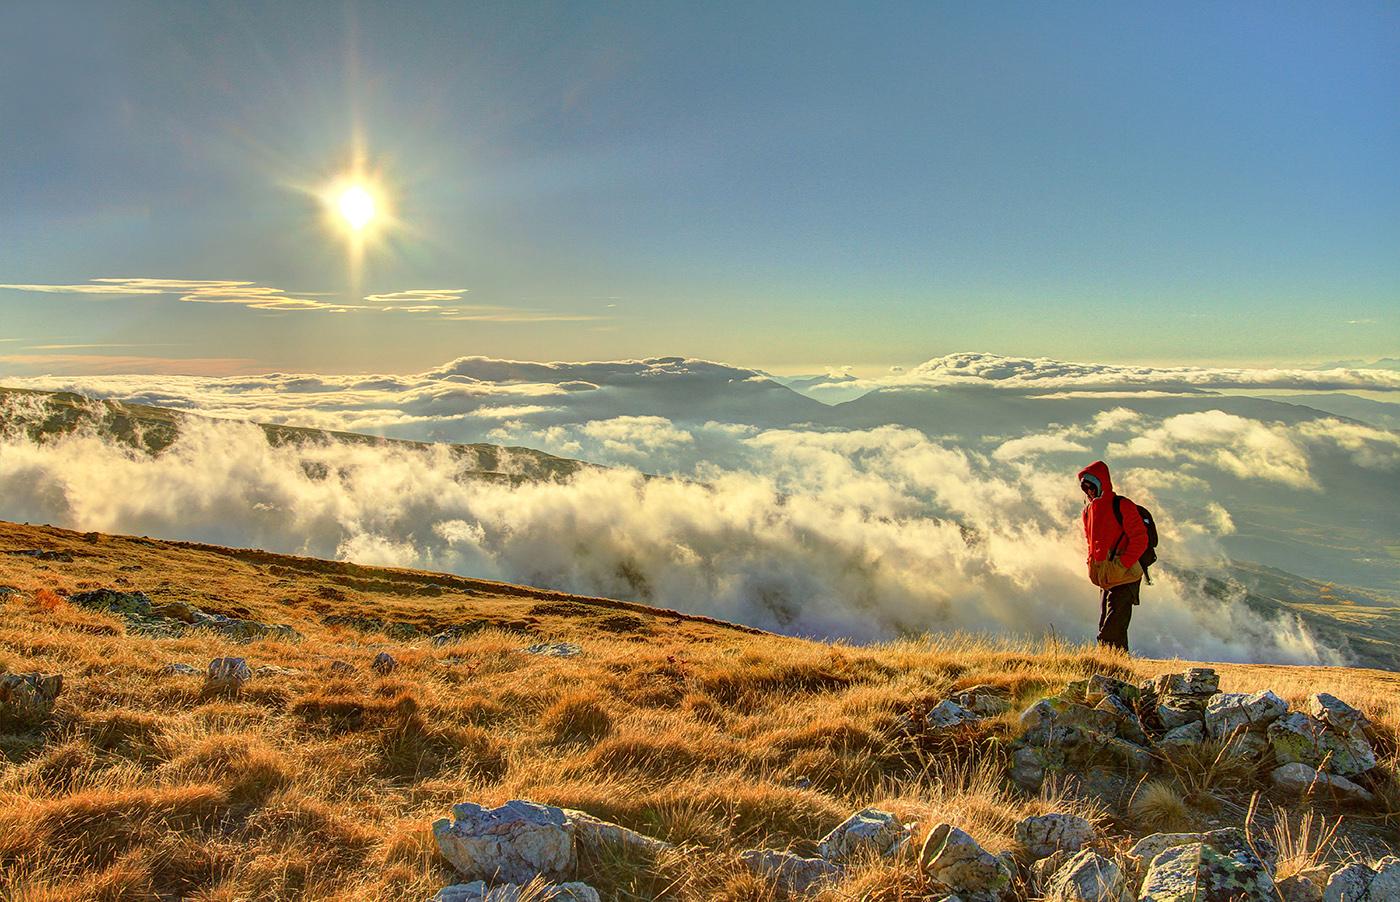 Magnificent sunset at Skarpa Peak